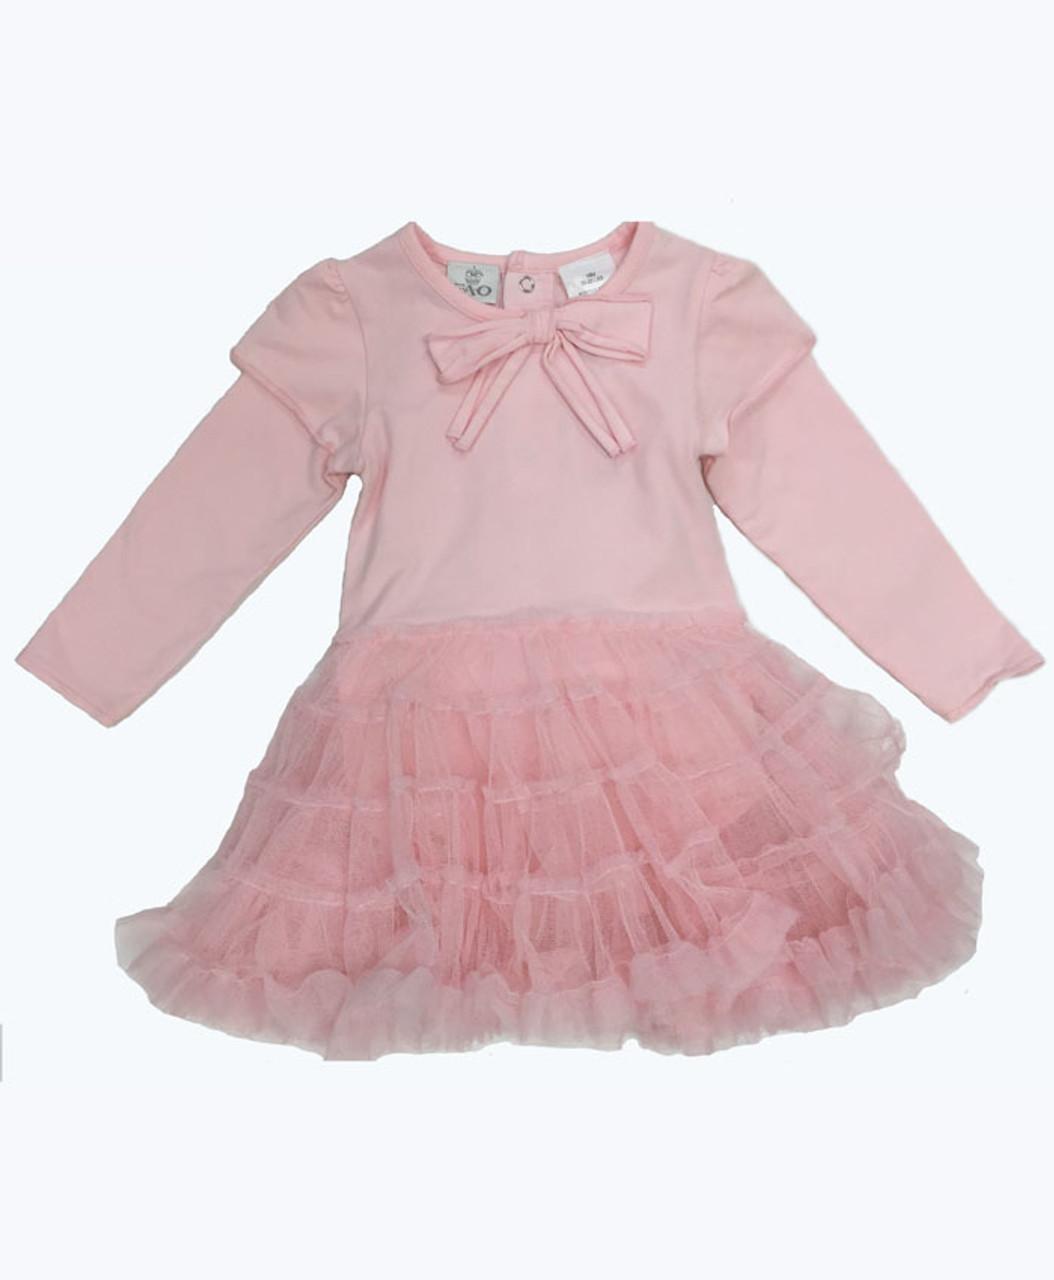 e60ac42b2ce3 Fao Schwarz Pink Tutu Dress   Berri Kids Resale Boutique